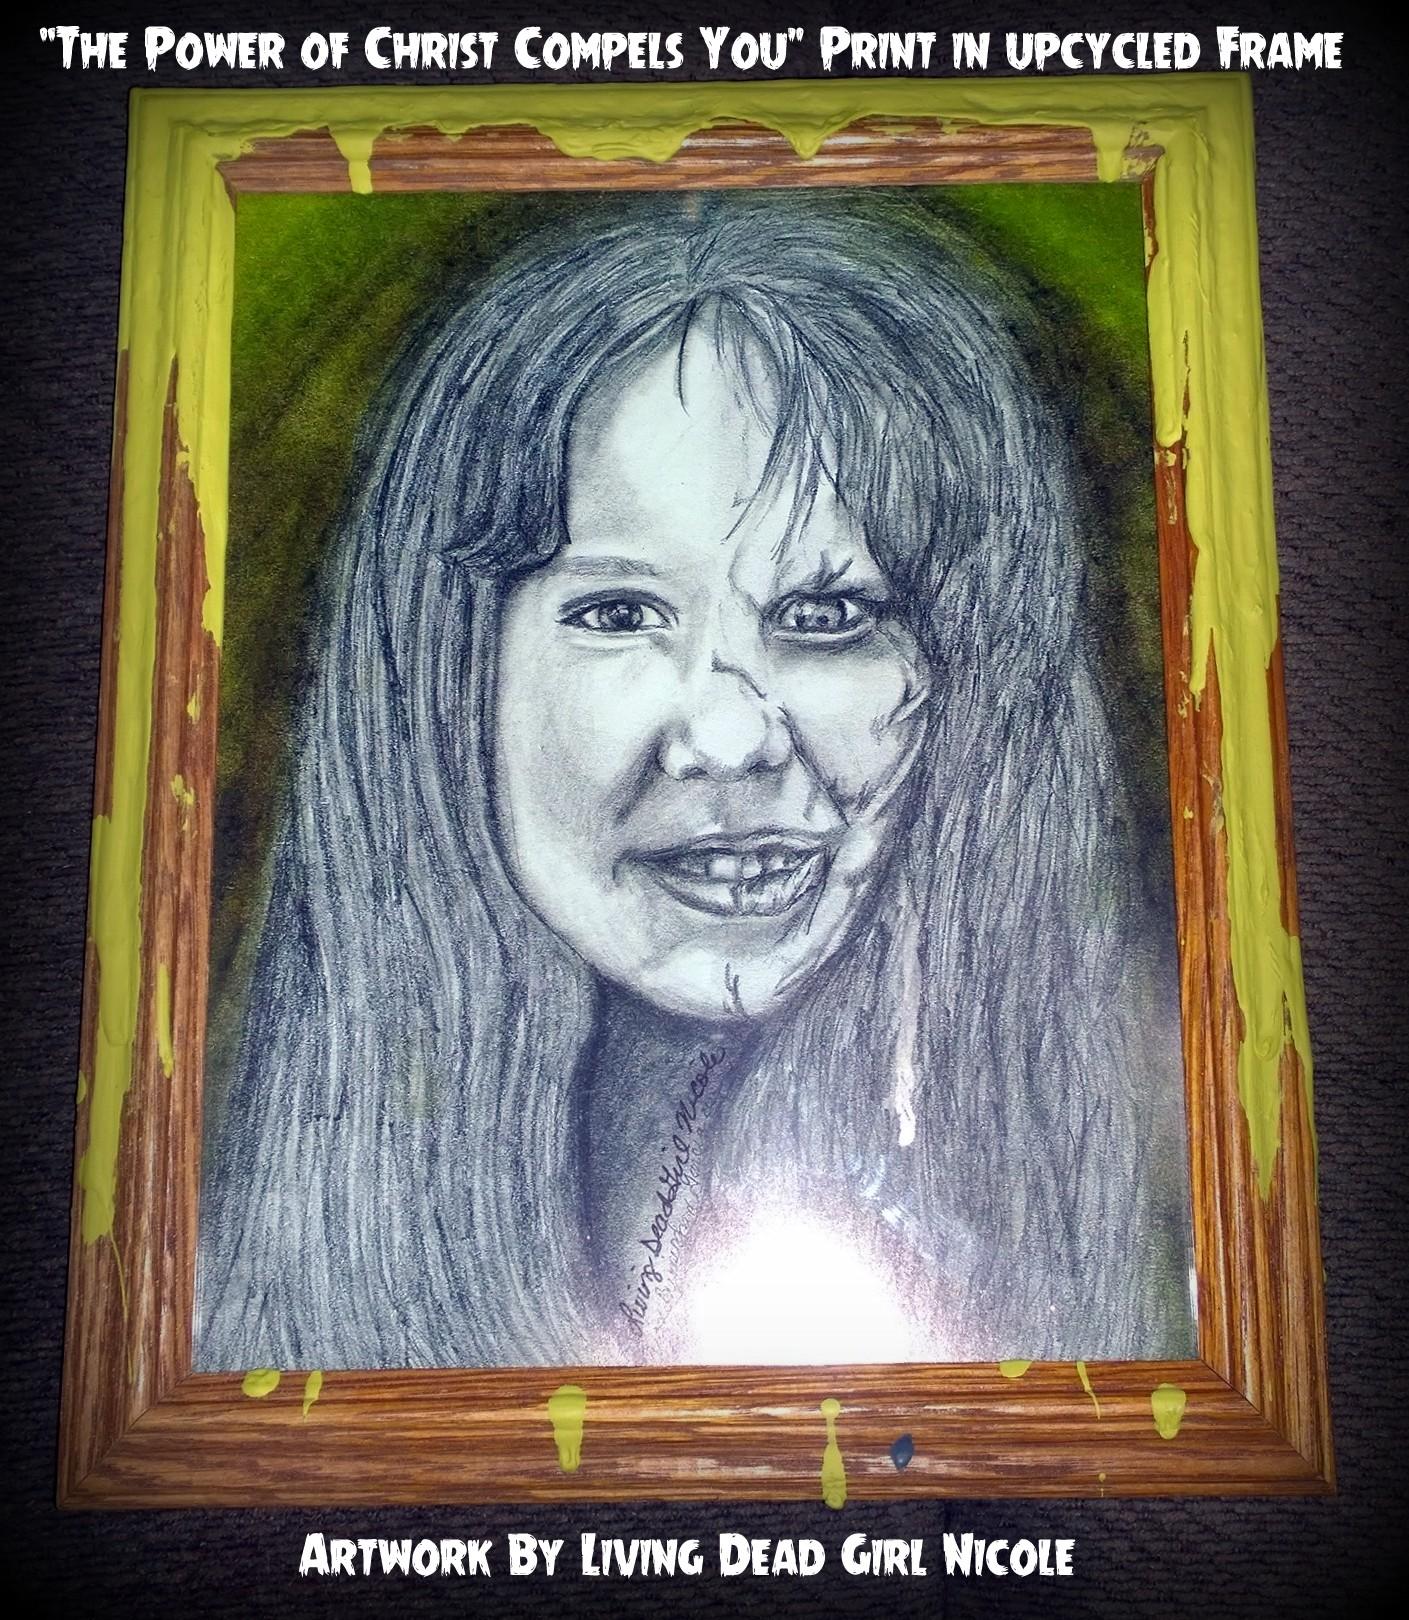 Regan Exorcist in upcycled frame